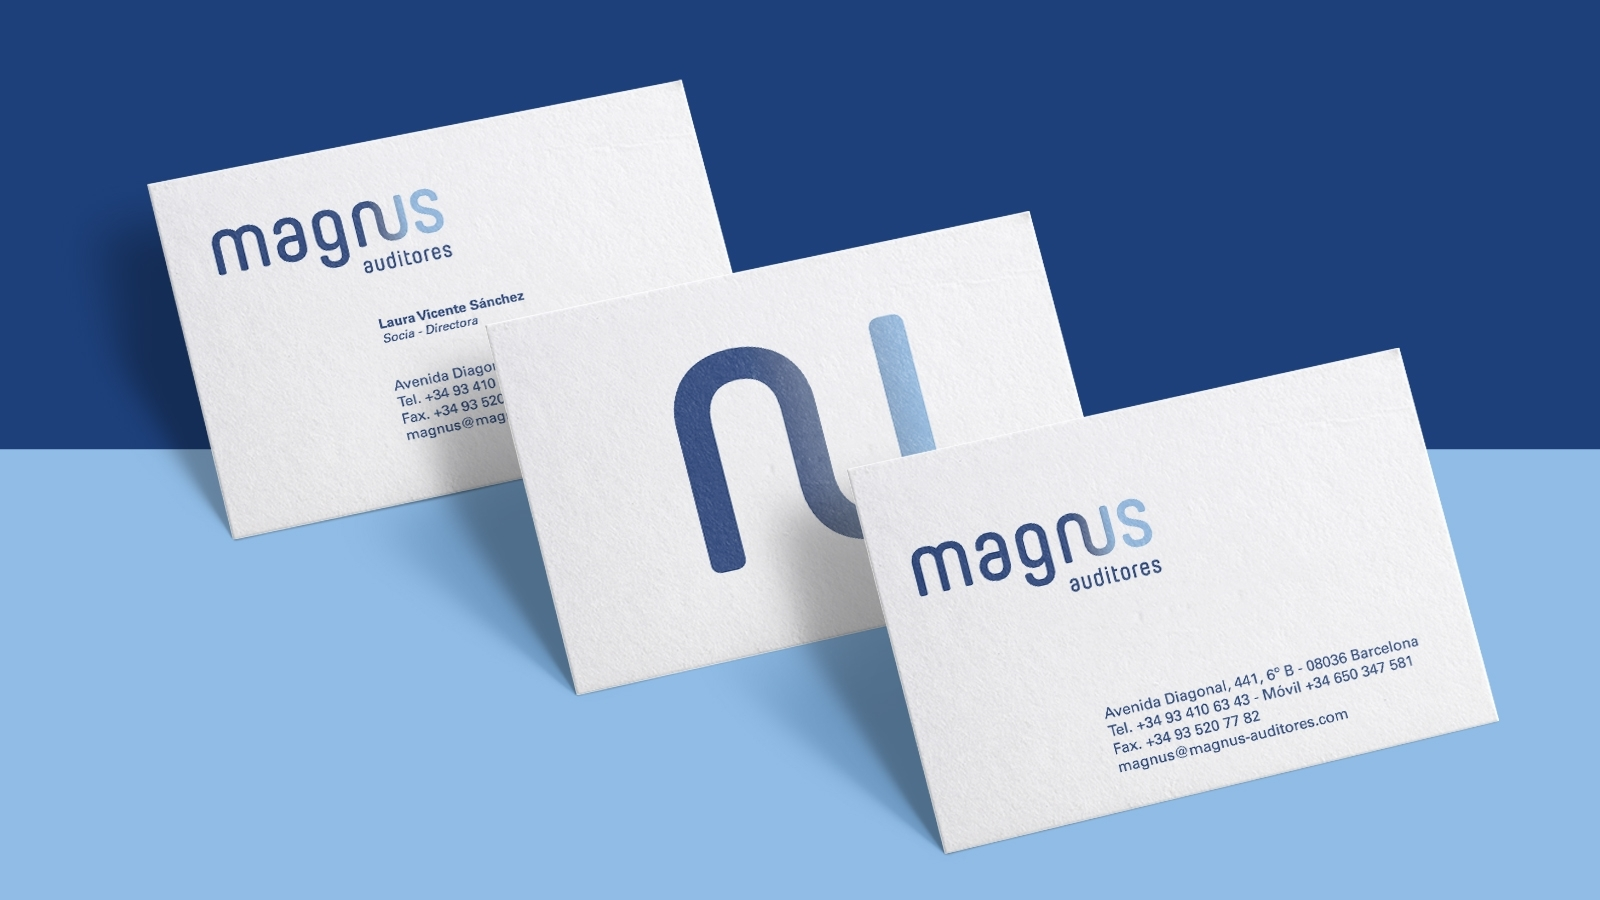 targetes-3-MAGNUS